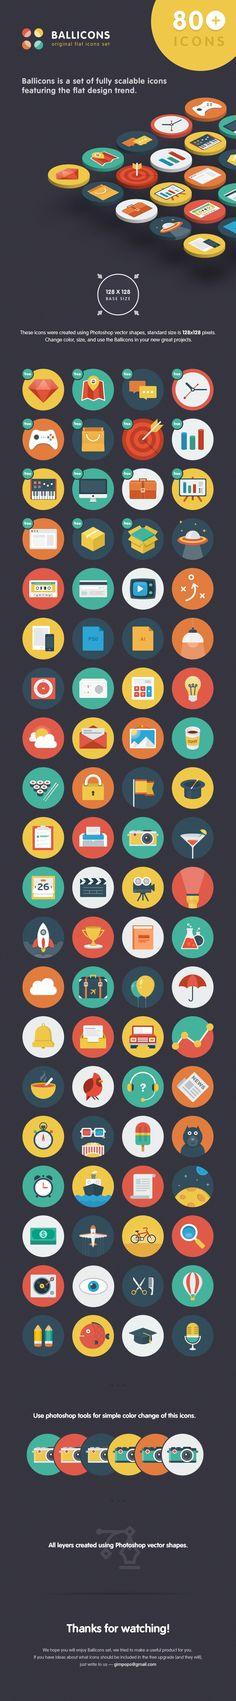 Flat Icon Set by Gimpo Studio (Nick & Oksana) - http://ballicons.net/